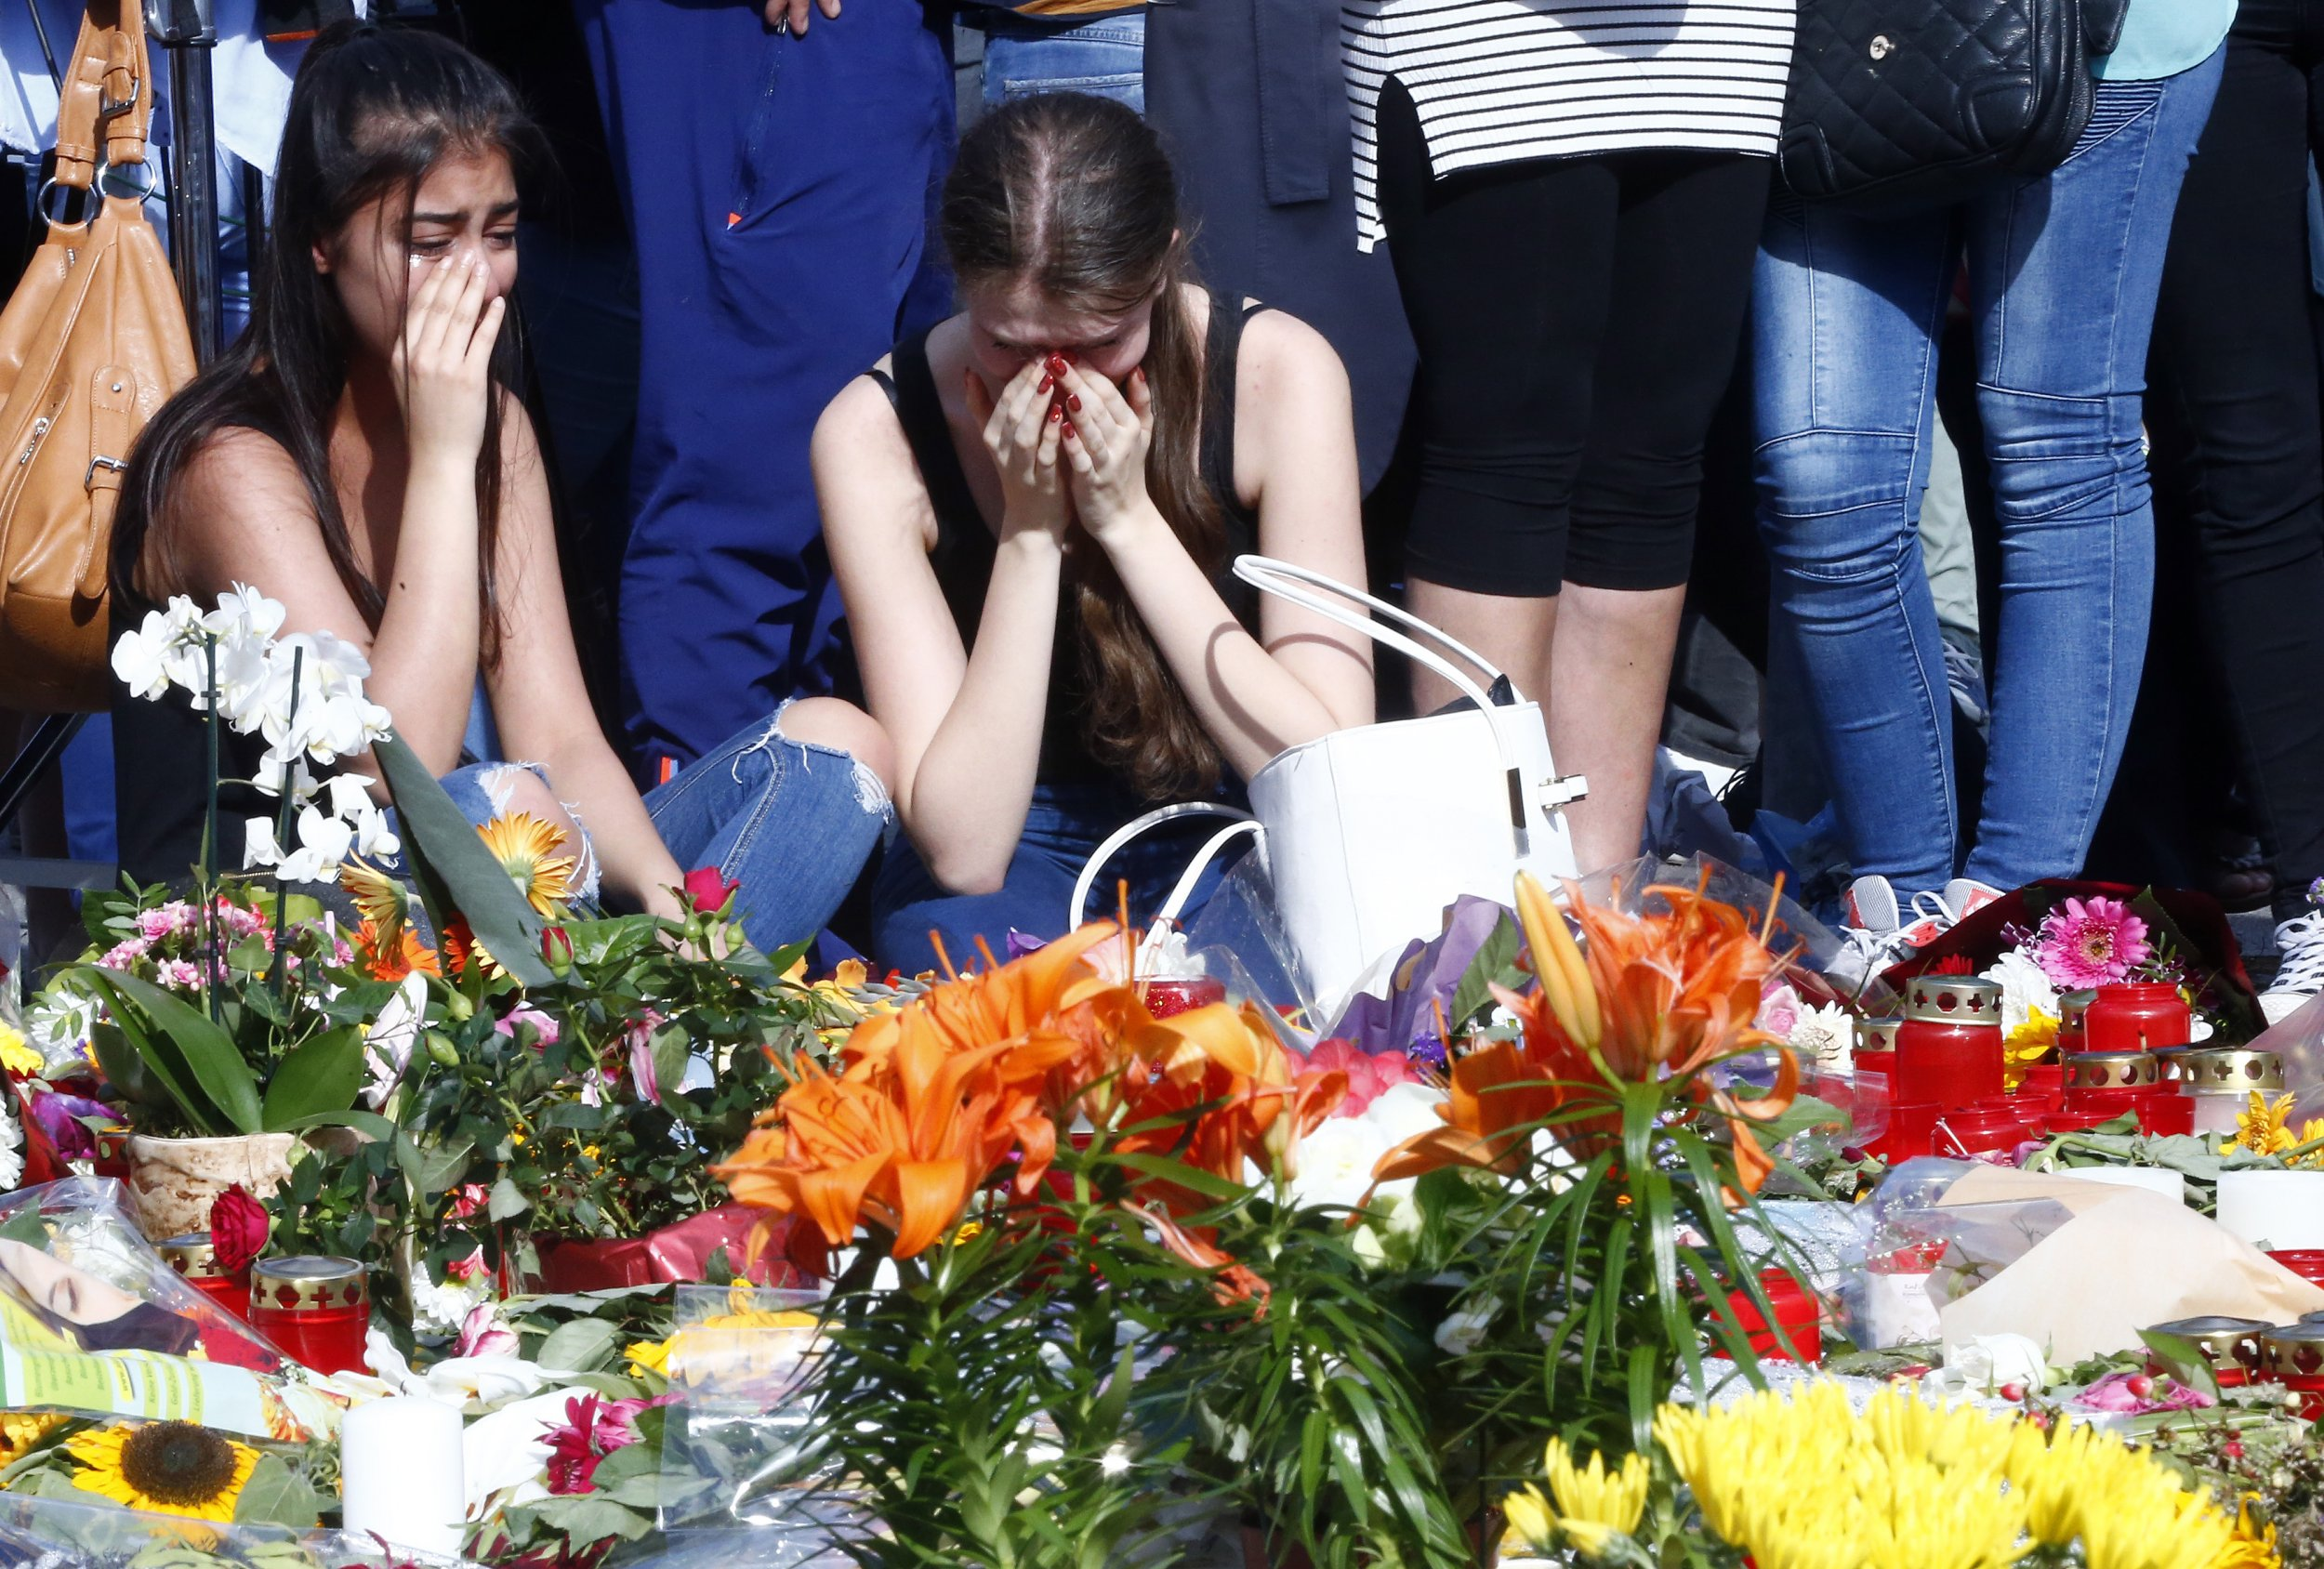 Munich Shooting memorial